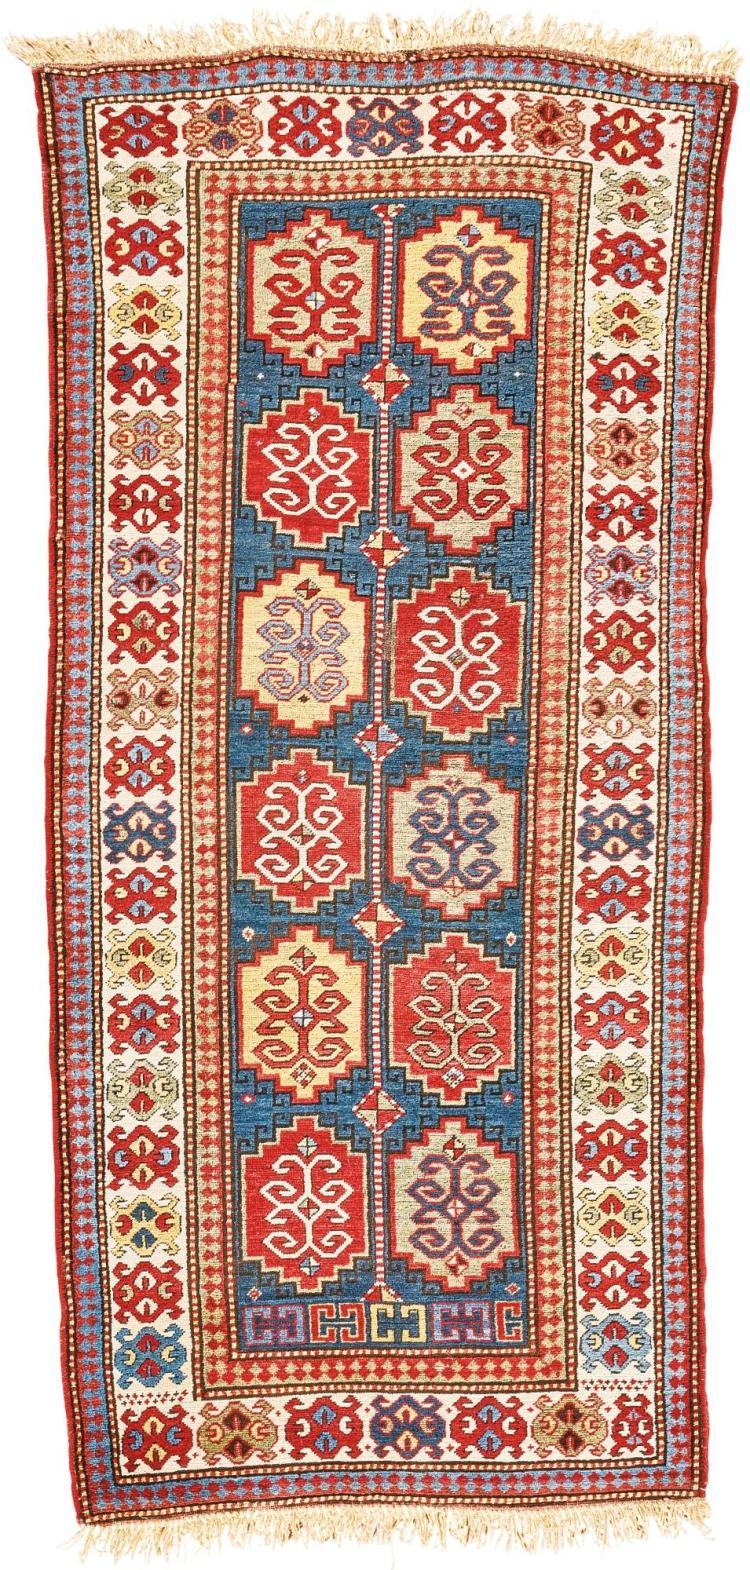 A KAZAK LONG RUG, WEST CAUCASUS |